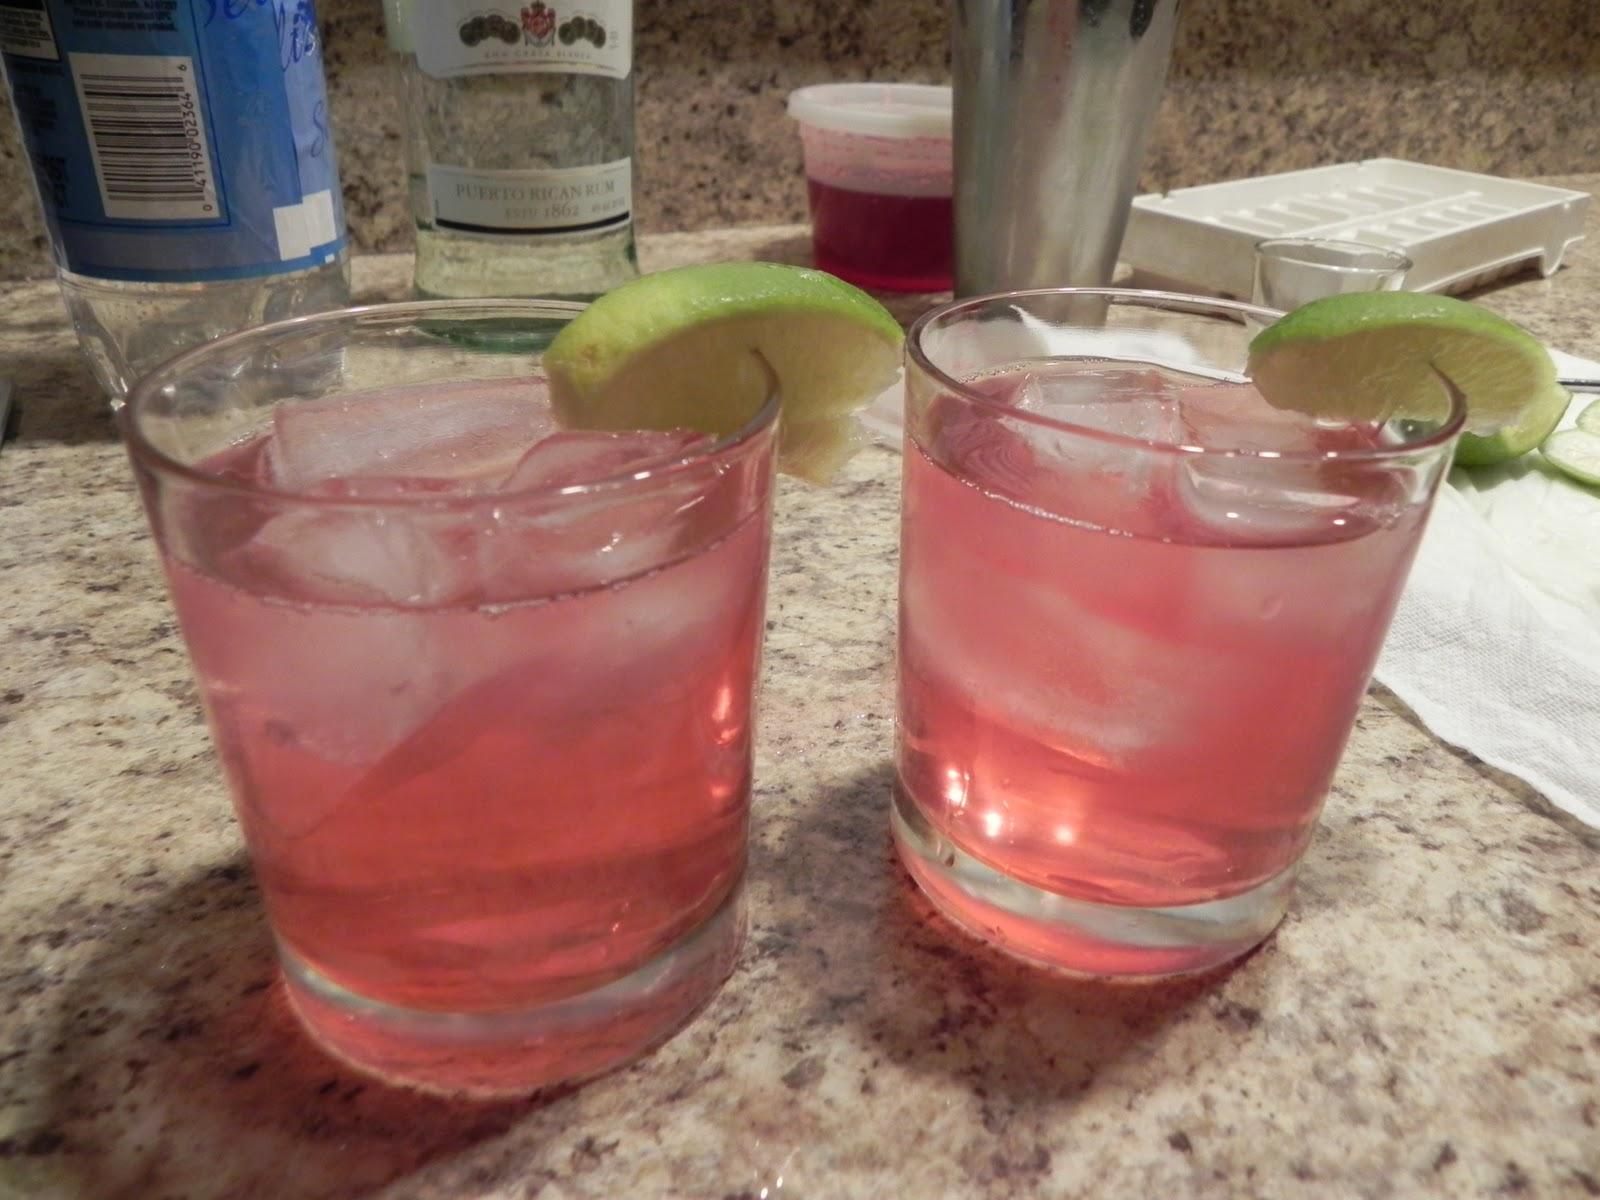 Pomegranate Rum Cooler – The Adirondack Chick